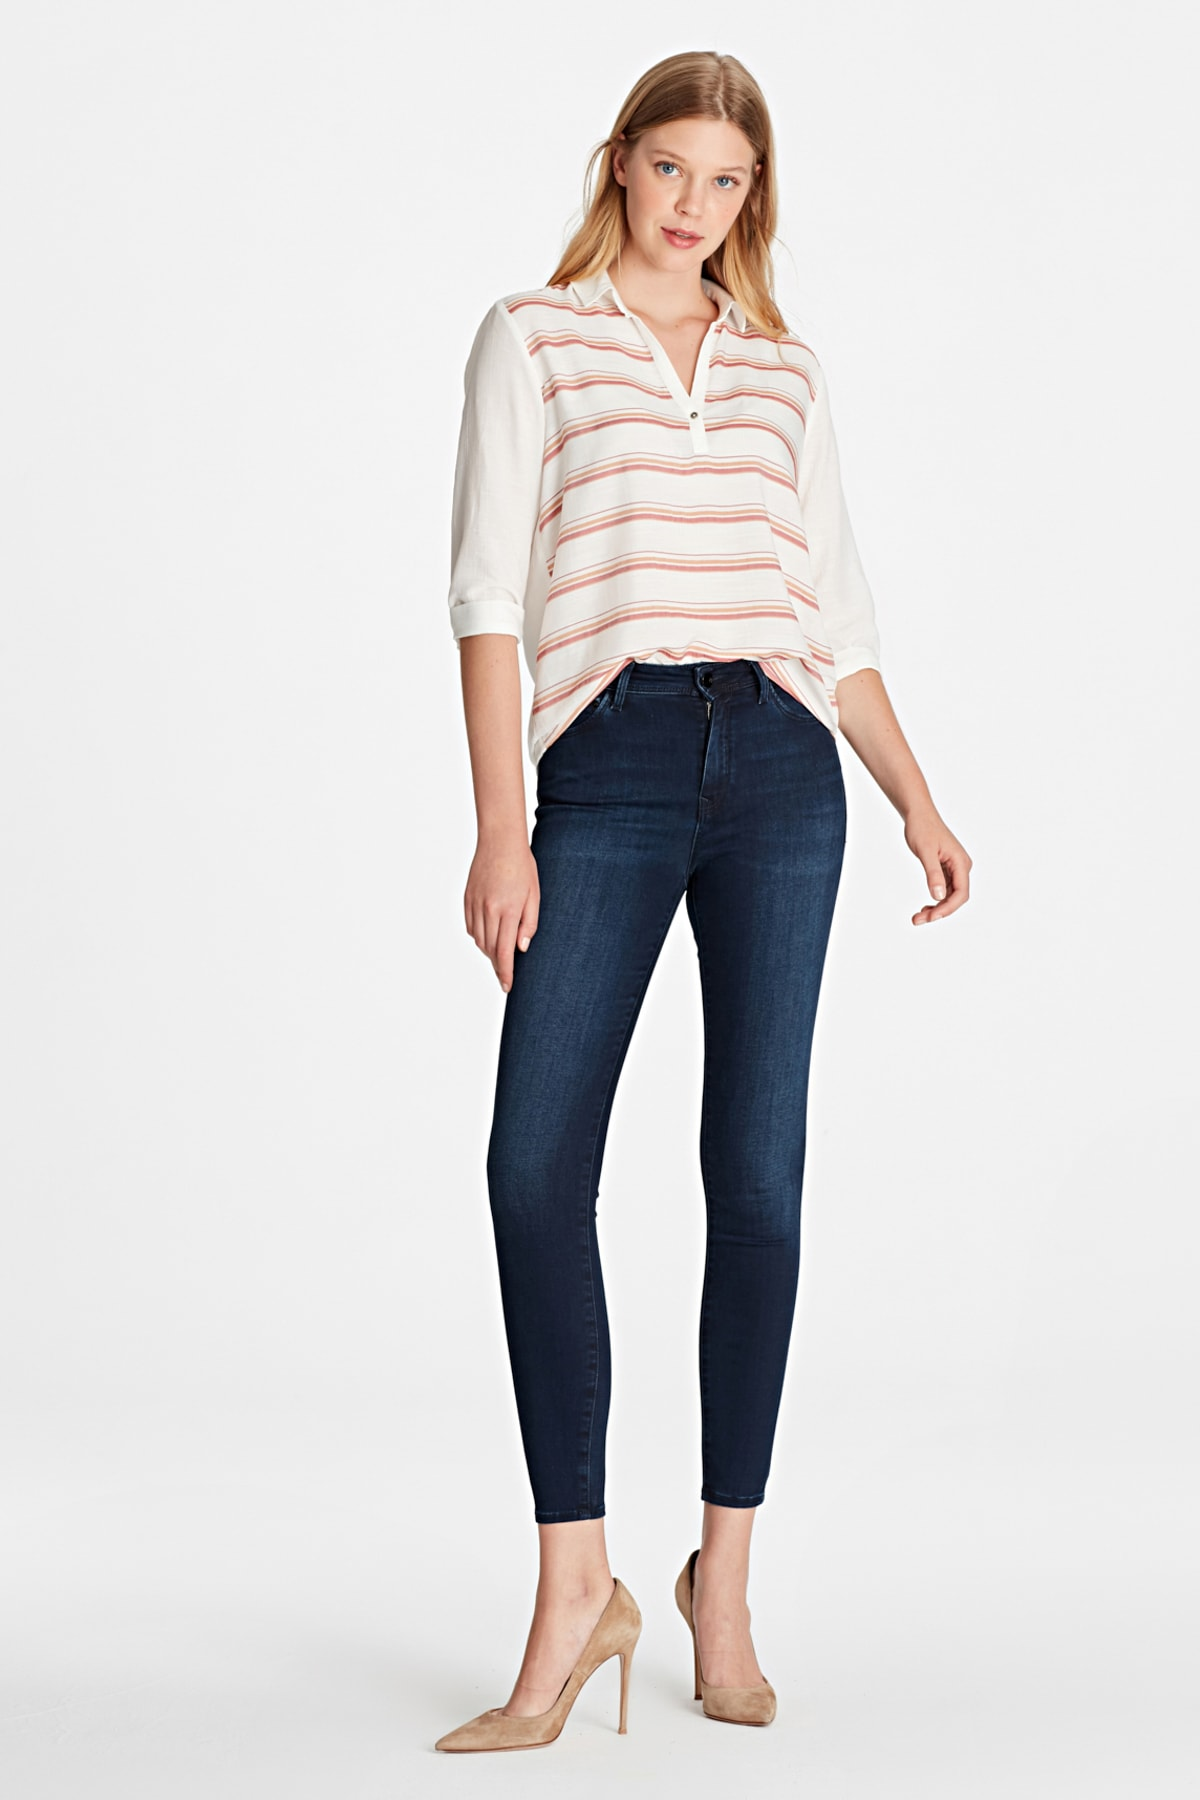 Kadın Tess Gold Lux Move Tencel Jean Pantolon  100328-24285